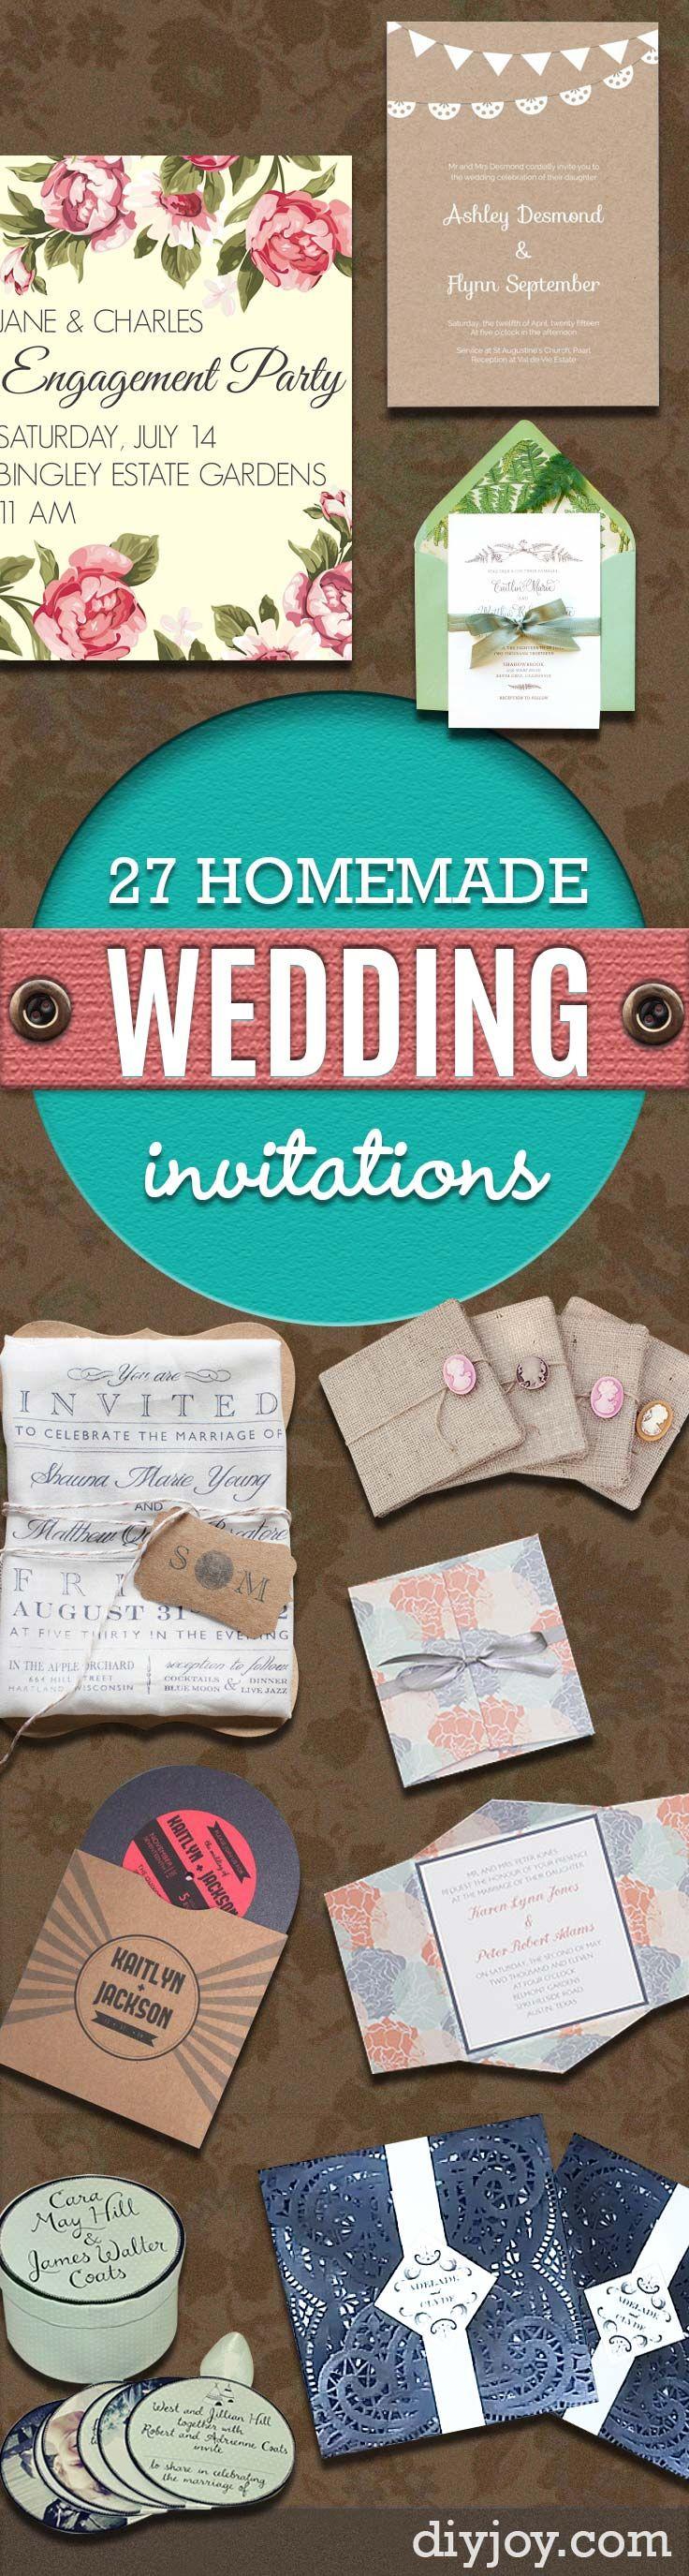 fabulous diy wedding invitation ideas wedding tricks